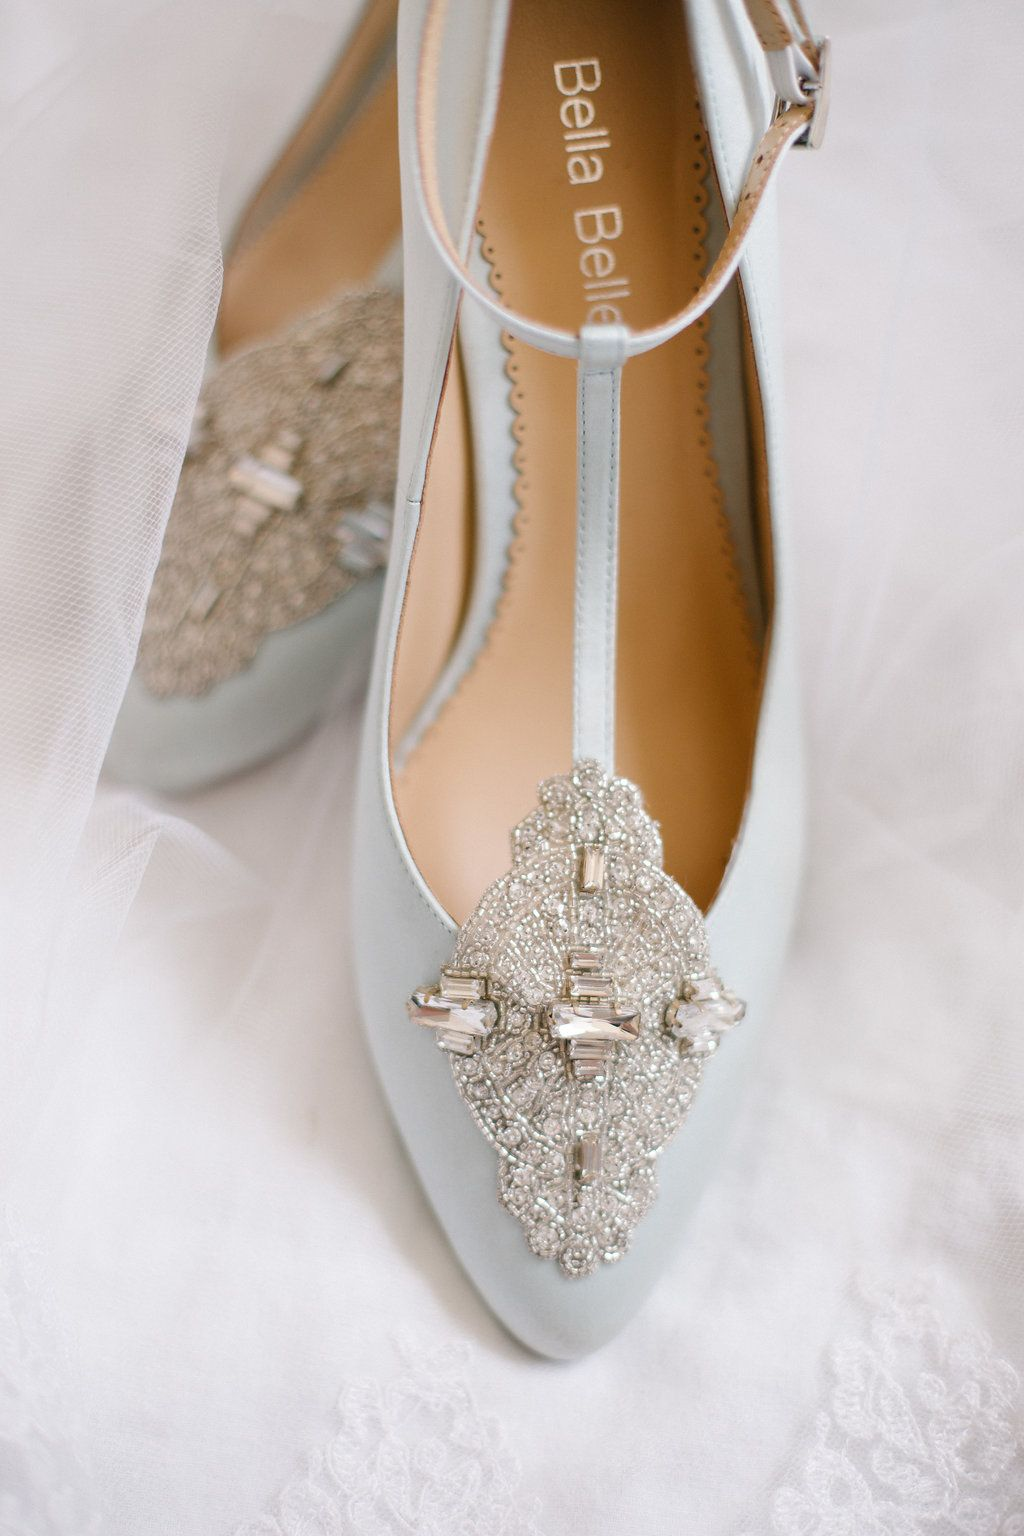 Something Blue Vintage Wedding Shoes Uk In 2020 Wedding Shoes Heels Wedding Shoes Vintage Wedding Shoes